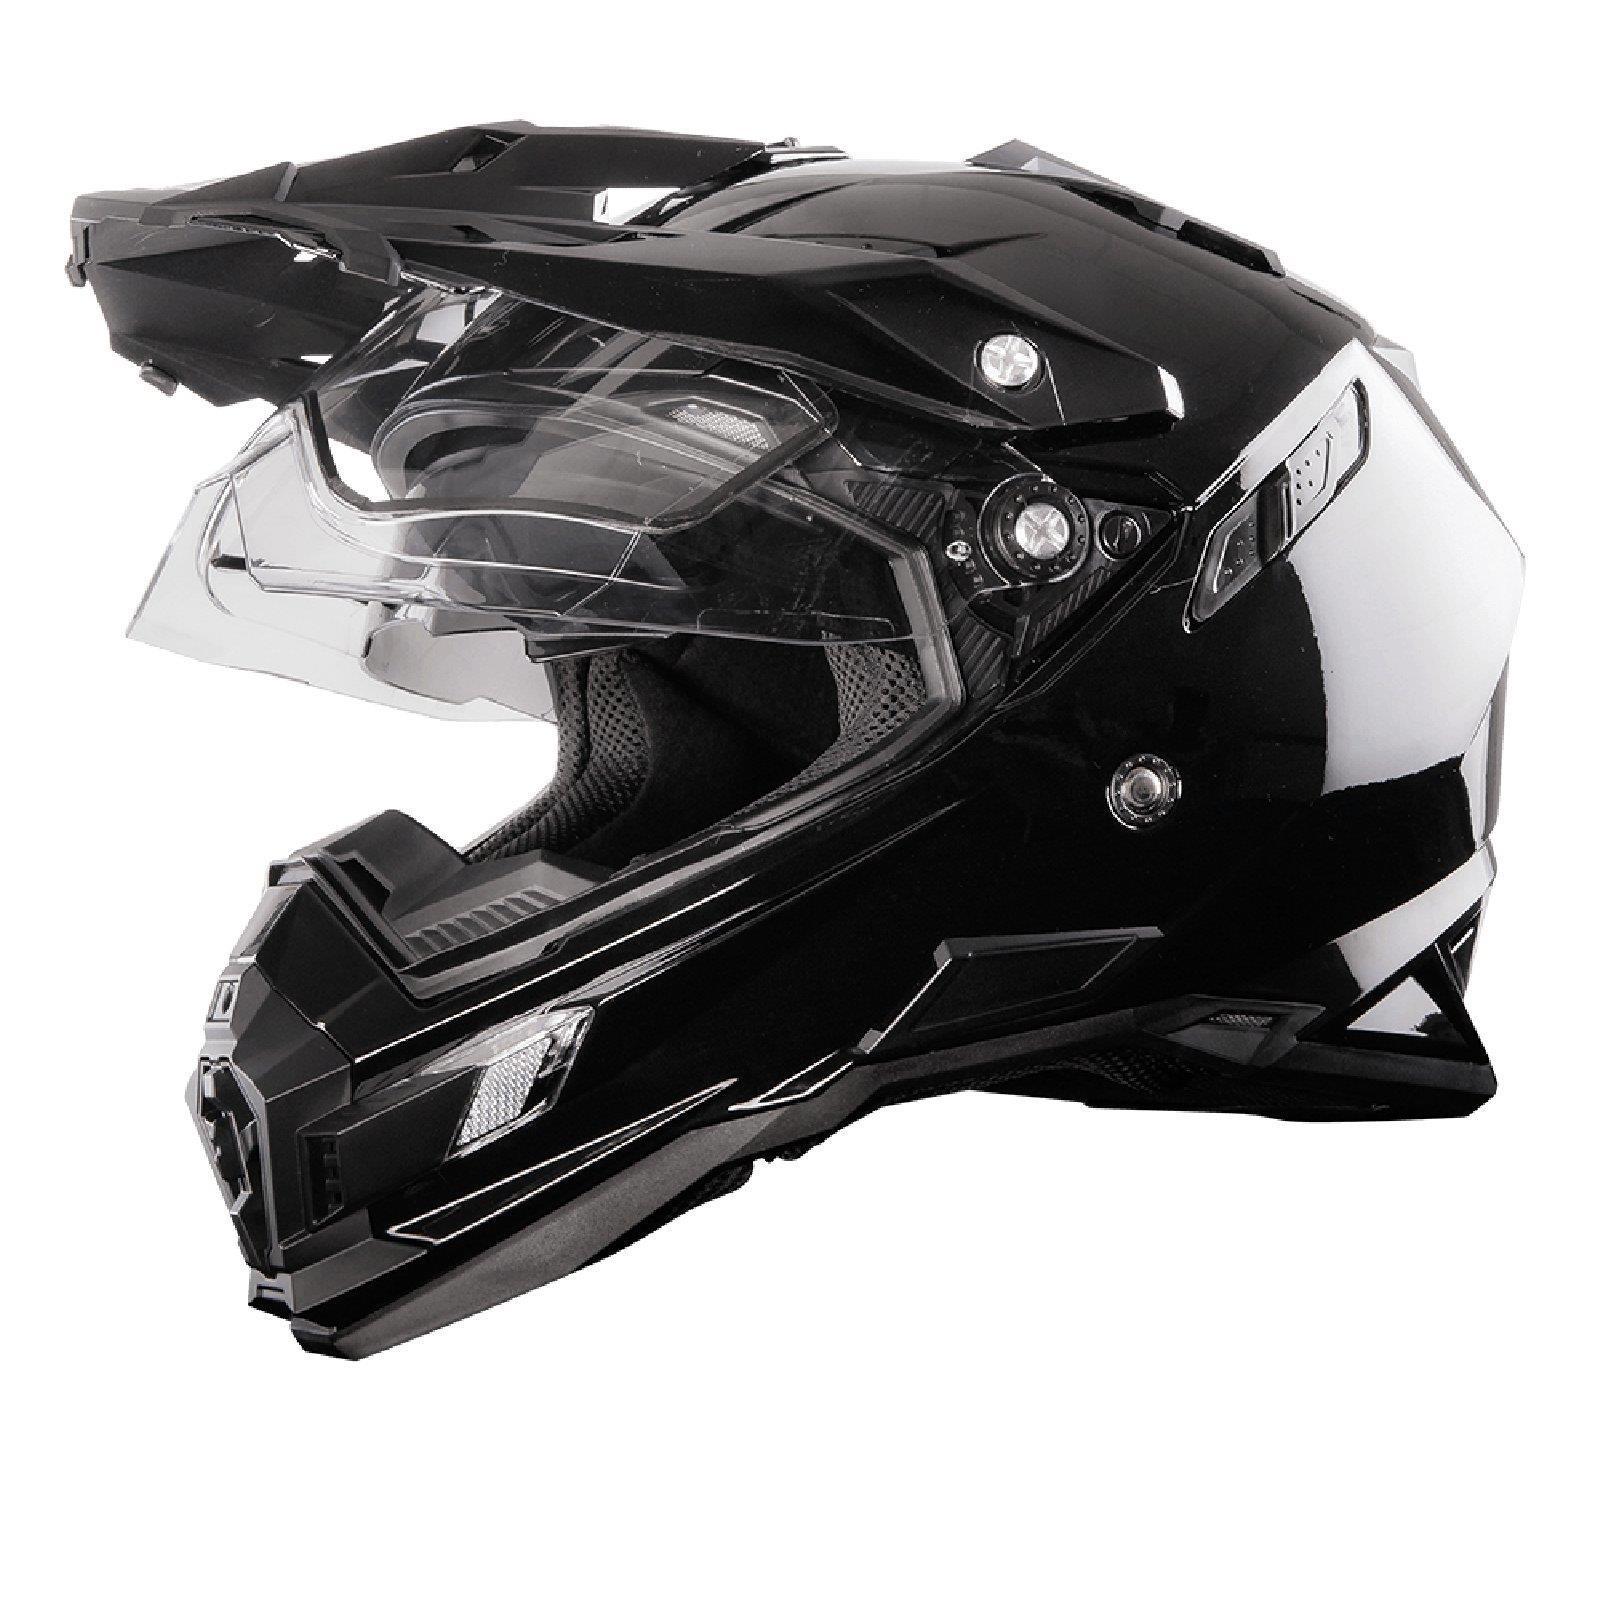 ONeal-Motocross-casco-MX-ENDURO-MOTO-BICI-FUORISTRADA-CROSS-Series-Adventure miniatura 130